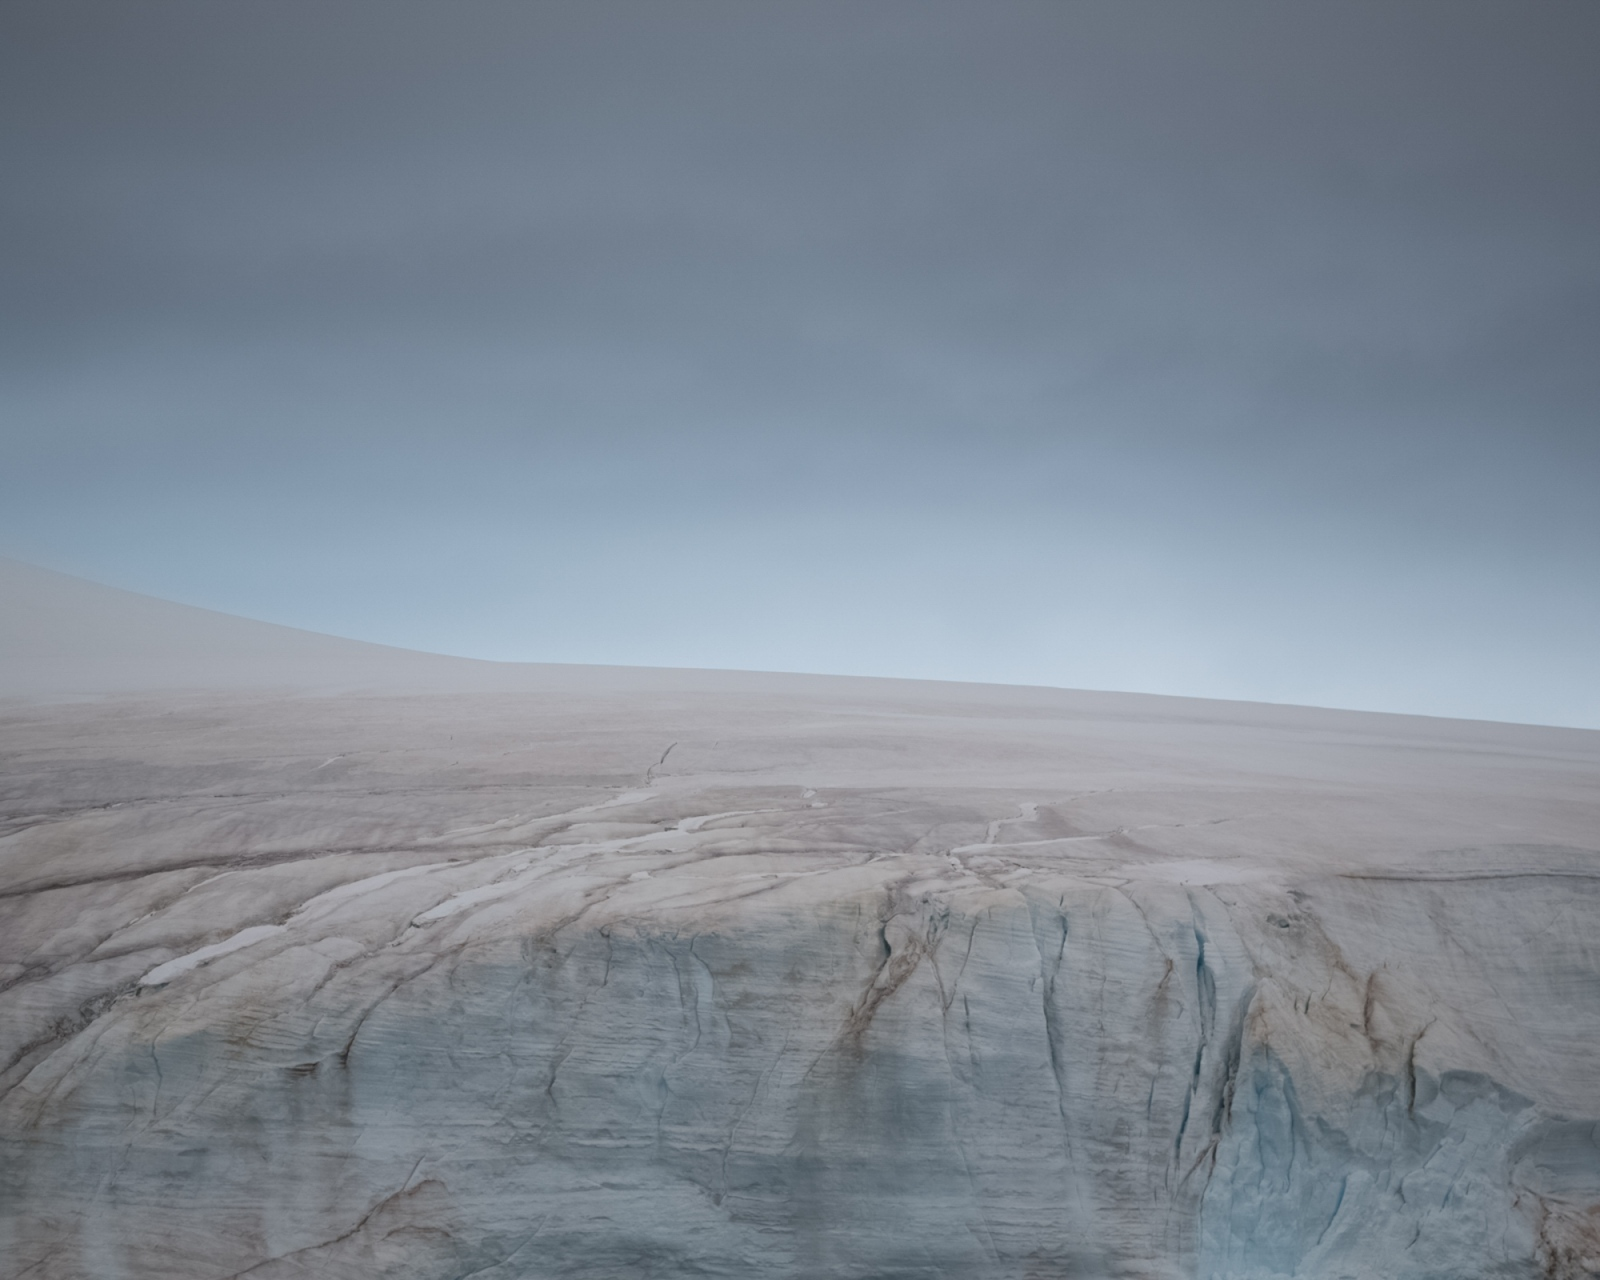 In February, snow algae paints the glaciated surface of Danco Island, Antarctica.